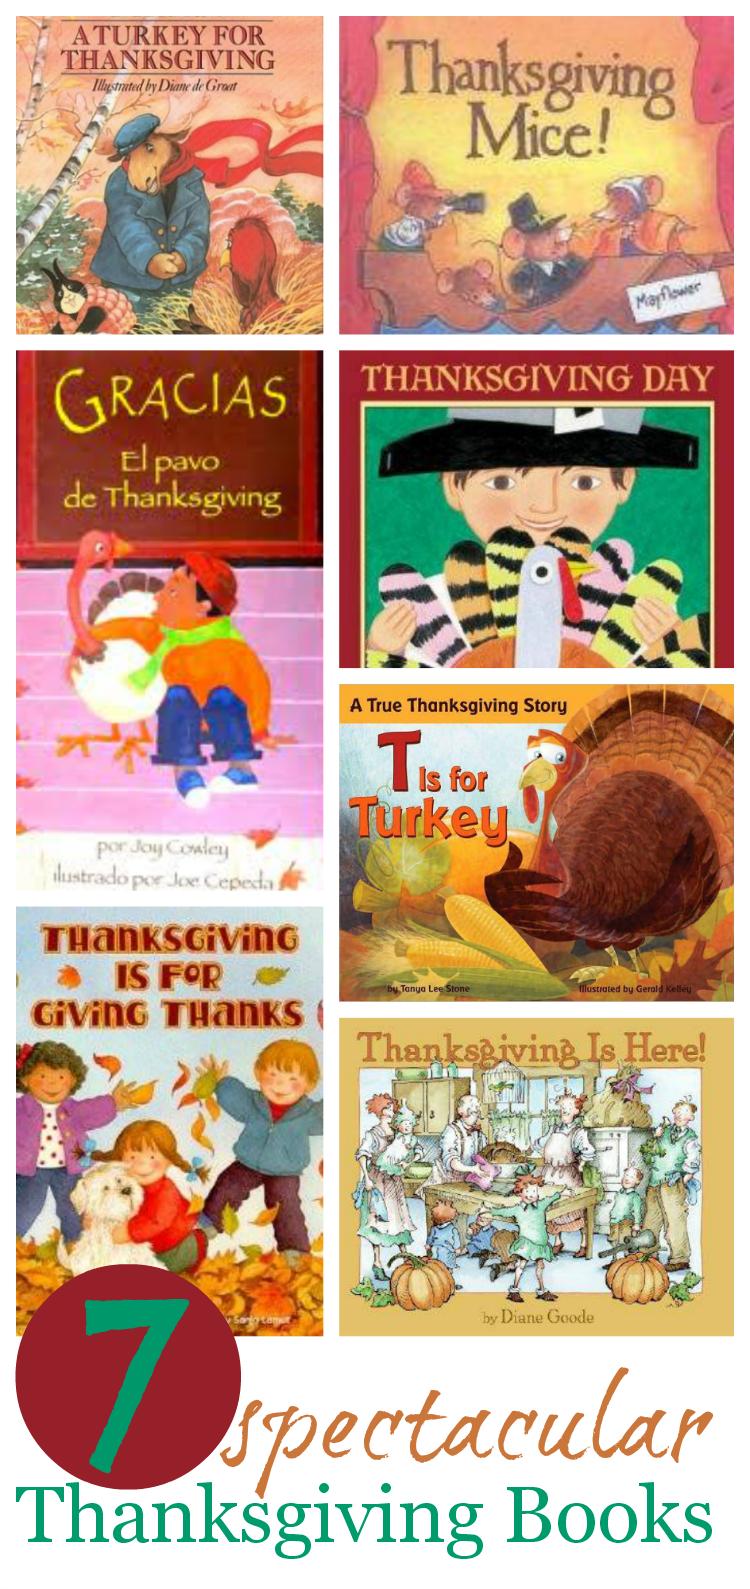 bb525dd484b5b37faf98cd5863179a67 - Thanksgiving Books For Kindergarten